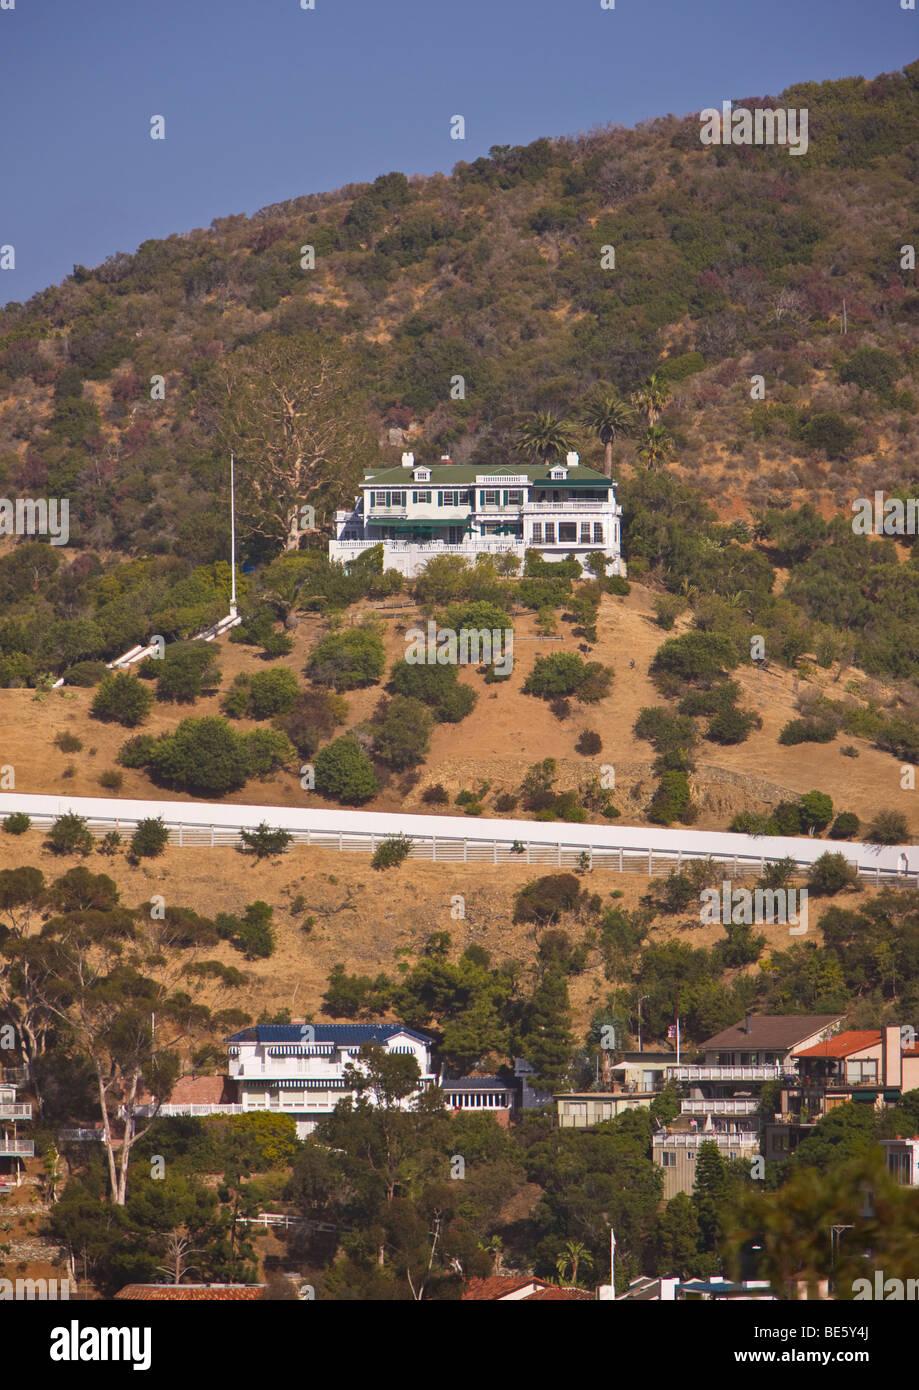 AVALON, CA, USA - The Inn at Mount Ada, formerly a Wrigley mansion, Santa Catalina Island - Stock Image